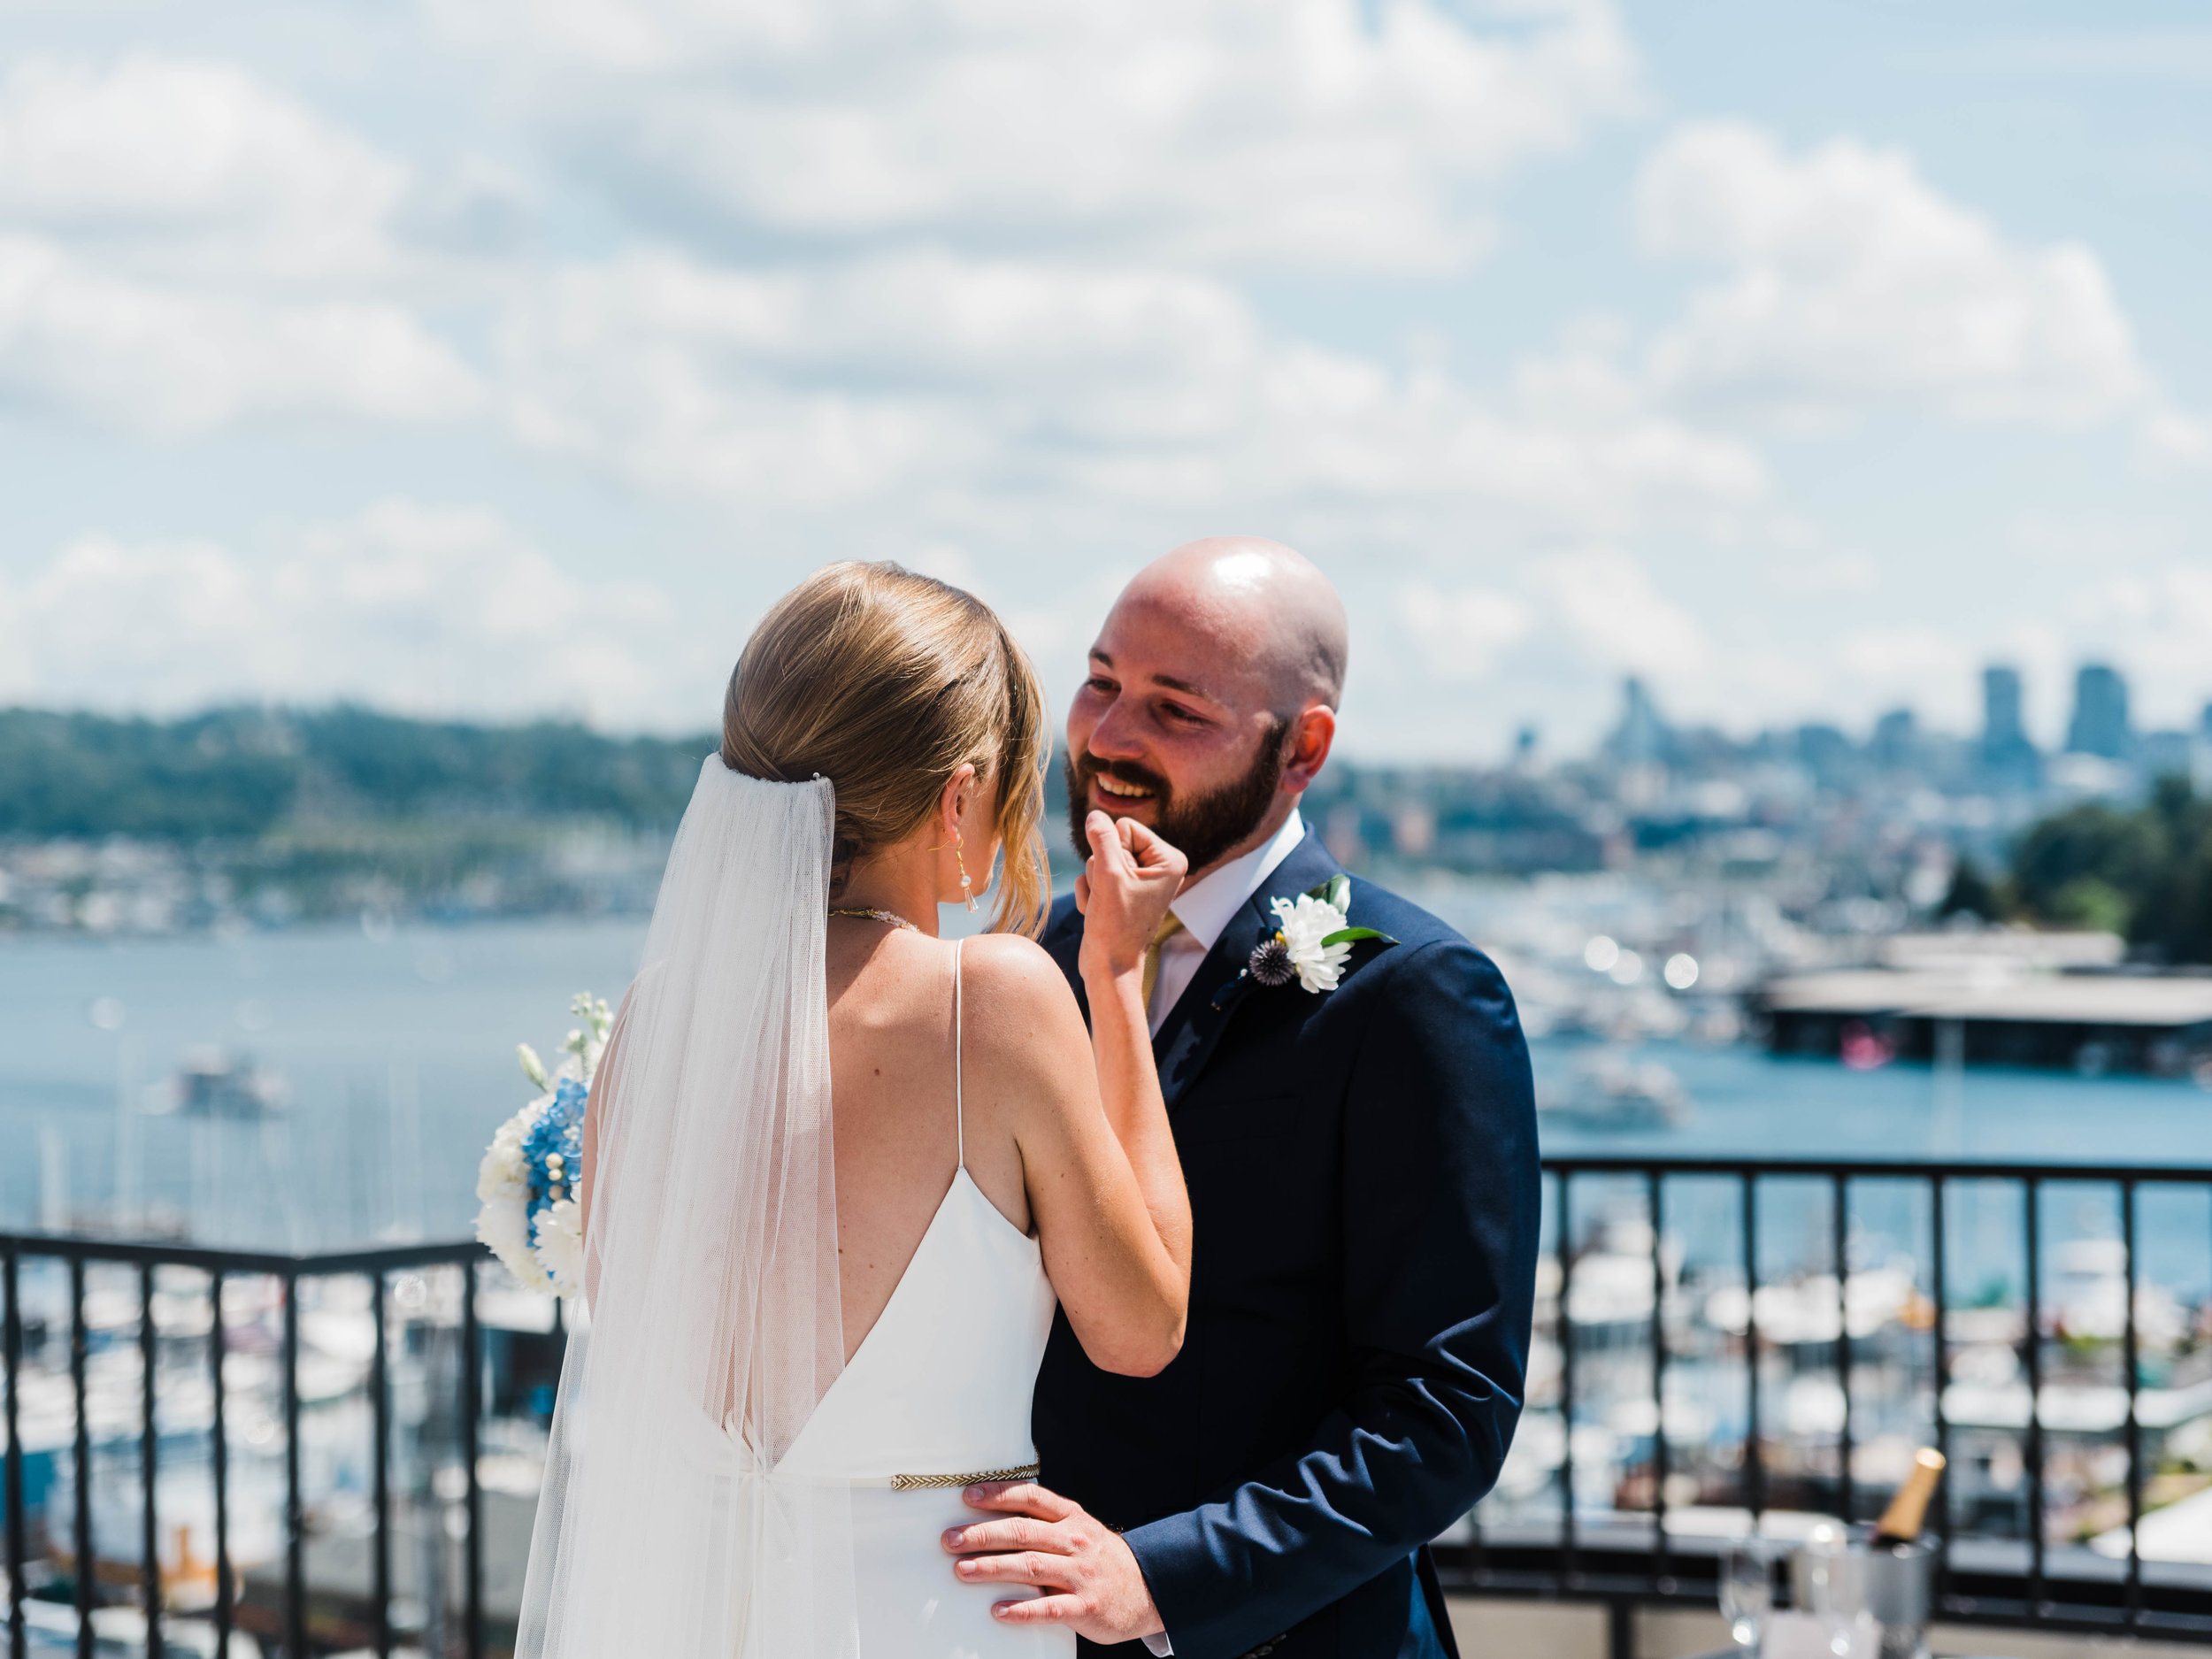 Seattle Wedding- MV Skansonia - Anna + Josh -  (355) - Copy.jpg